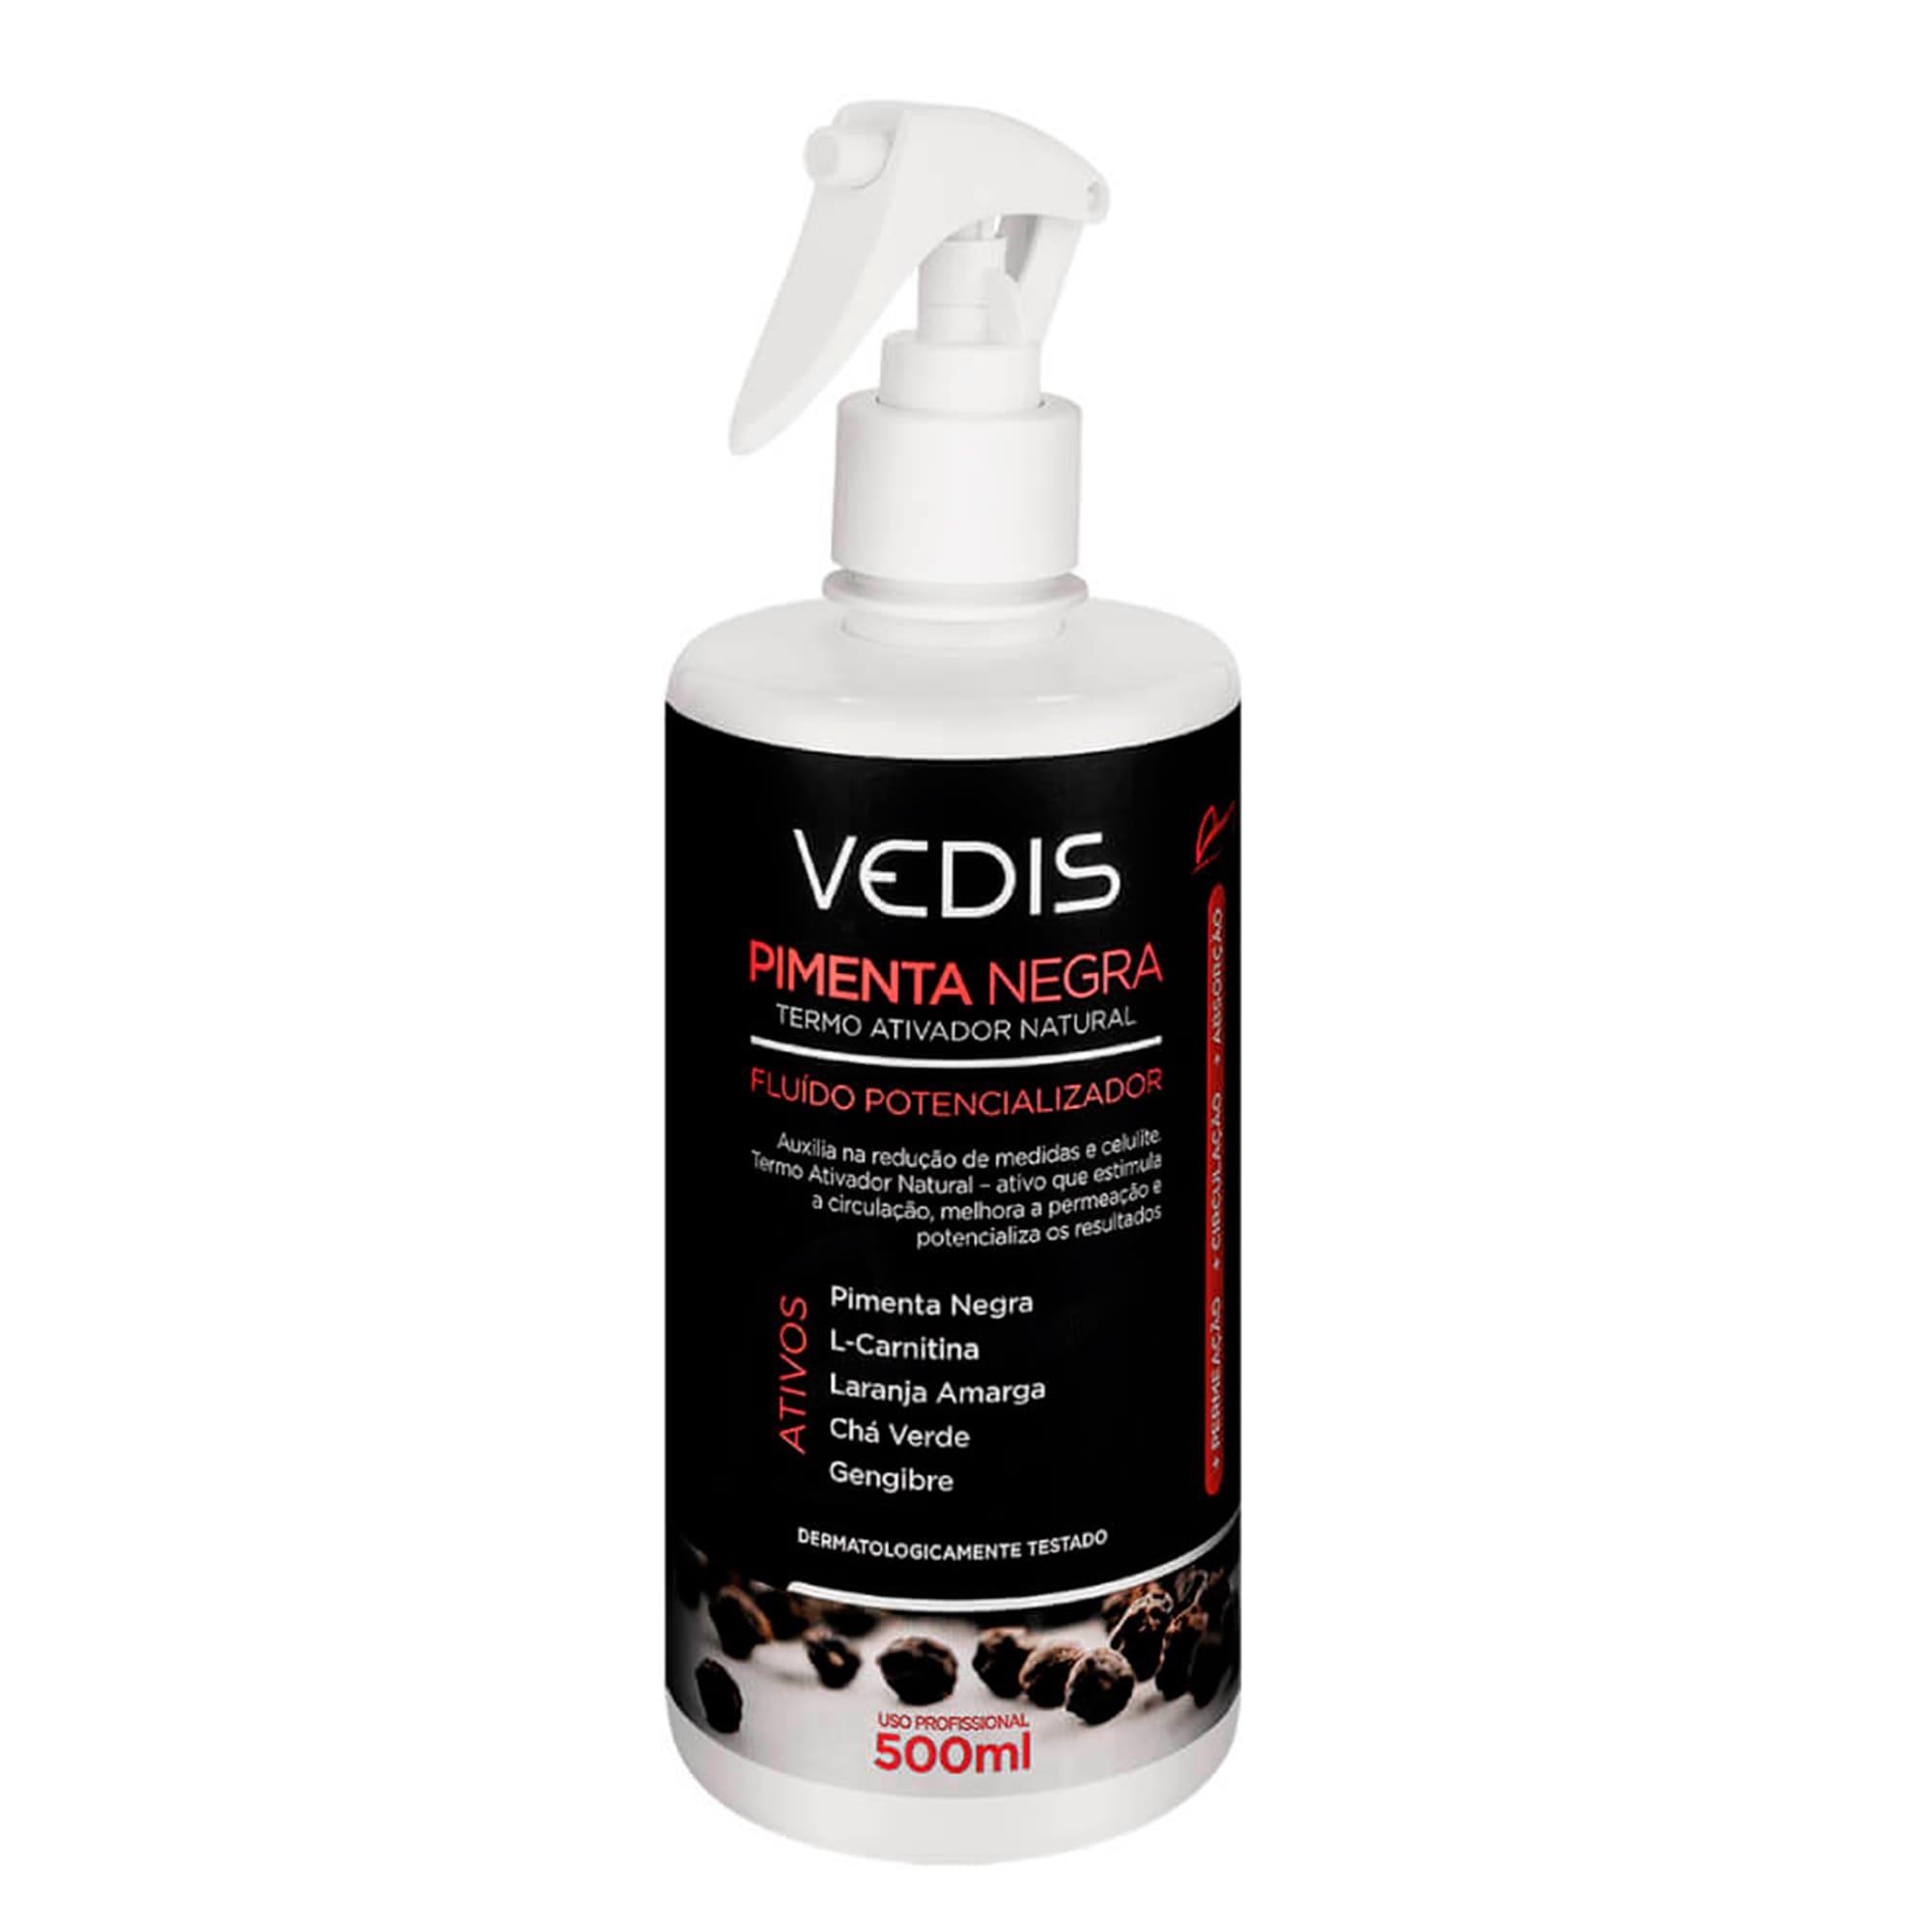 Fluído Potencializador Pimenta Negra 500ml - Vedis